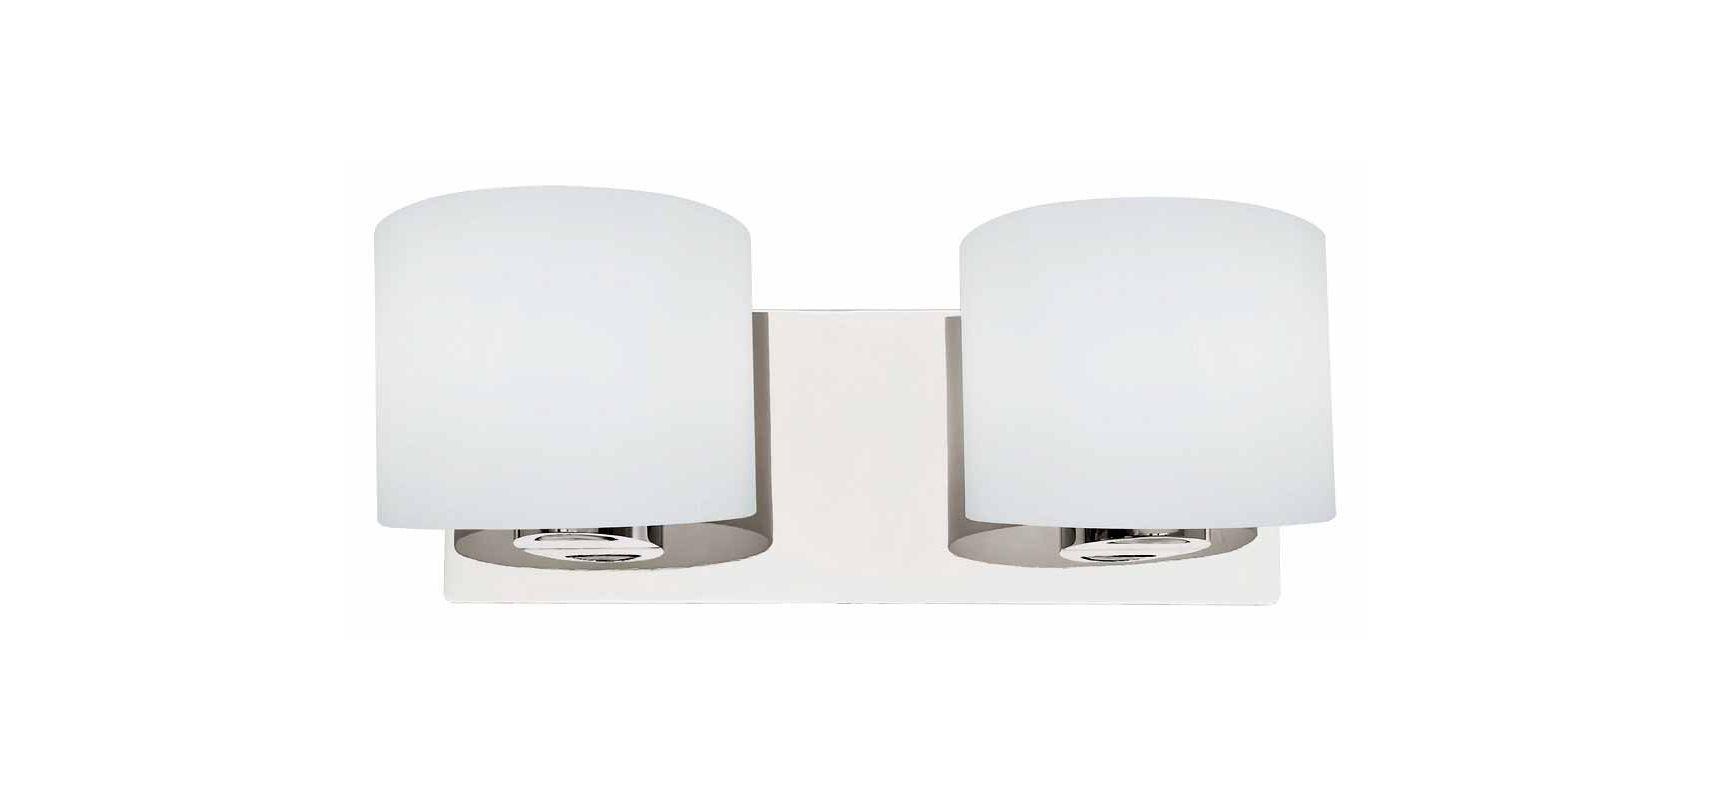 DVI Lighting DVP3122 Normandy Two-Light Bathroom Fixture Chrome with